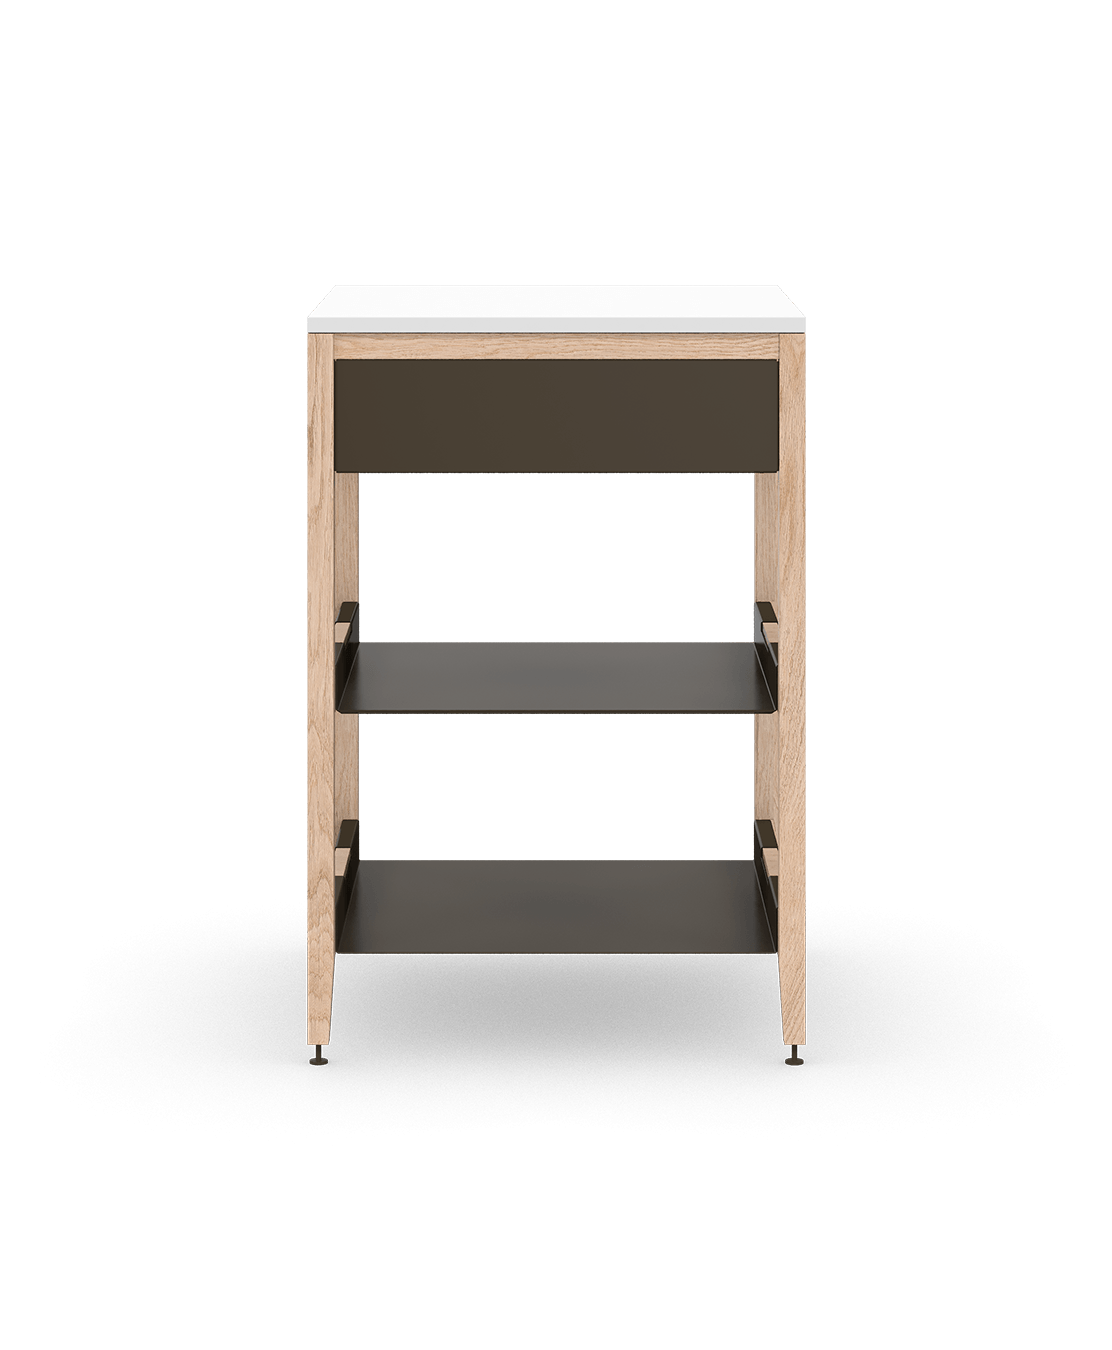 coquo radix white oak solid wood modular 2 shelves 1 drawer base kitchen cabinet 27 inch C1-C-27SB-1021-NA